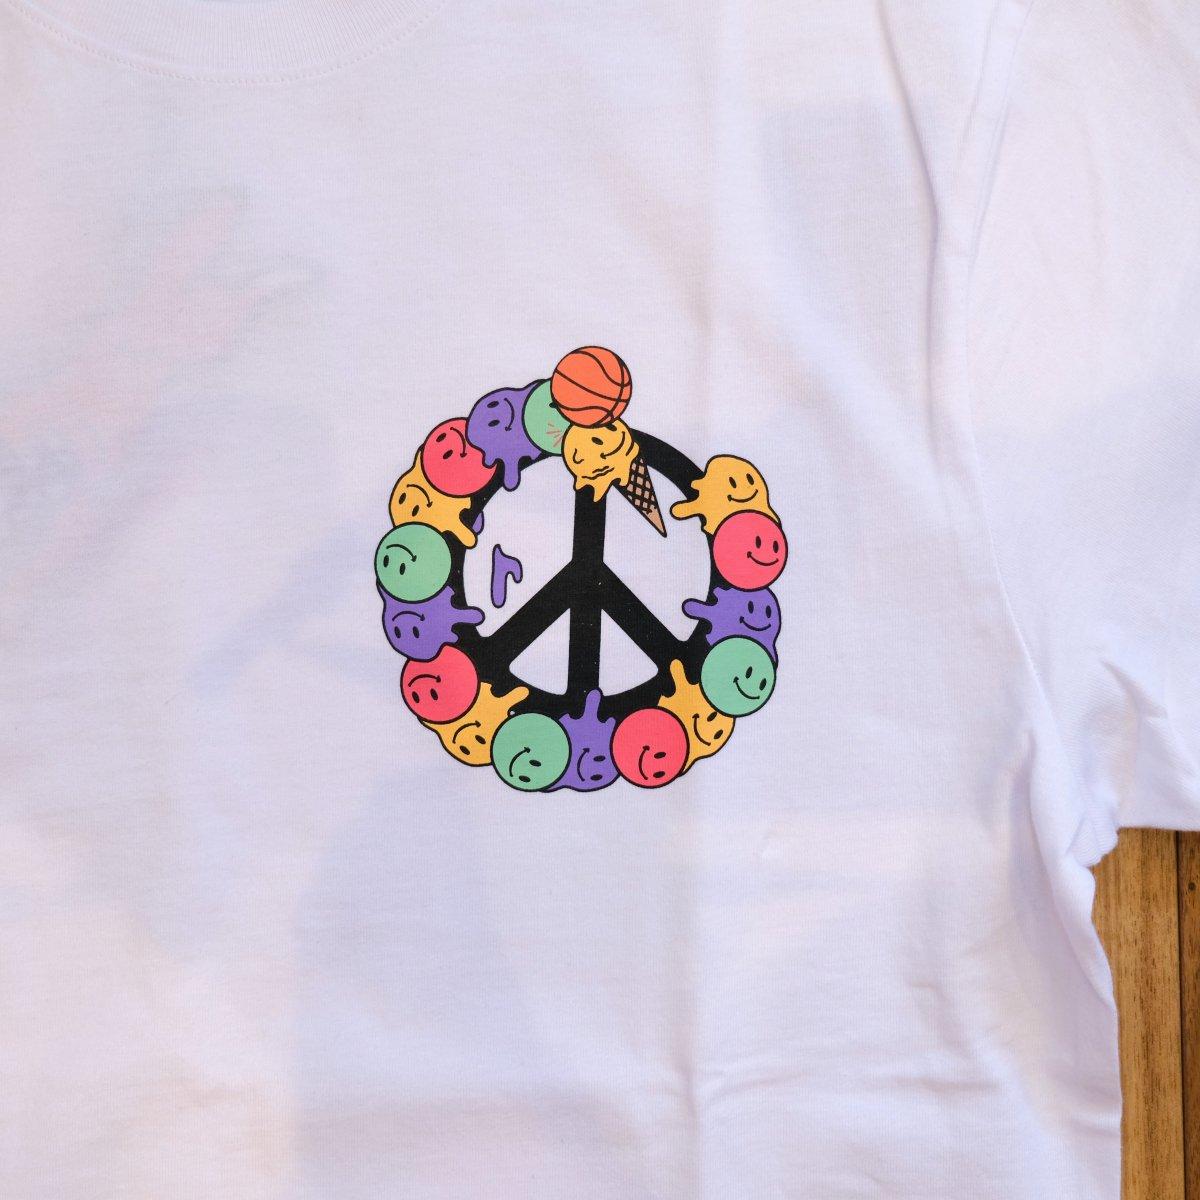 <img class='new_mark_img1' src='https://img.shop-pro.jp/img/new/icons3.gif' style='border:none;display:inline;margin:0px;padding:0px;width:auto;' />ICE CREAM アイスクリーム / Tシャツ PEACE T-SHIRT 【WHITE】